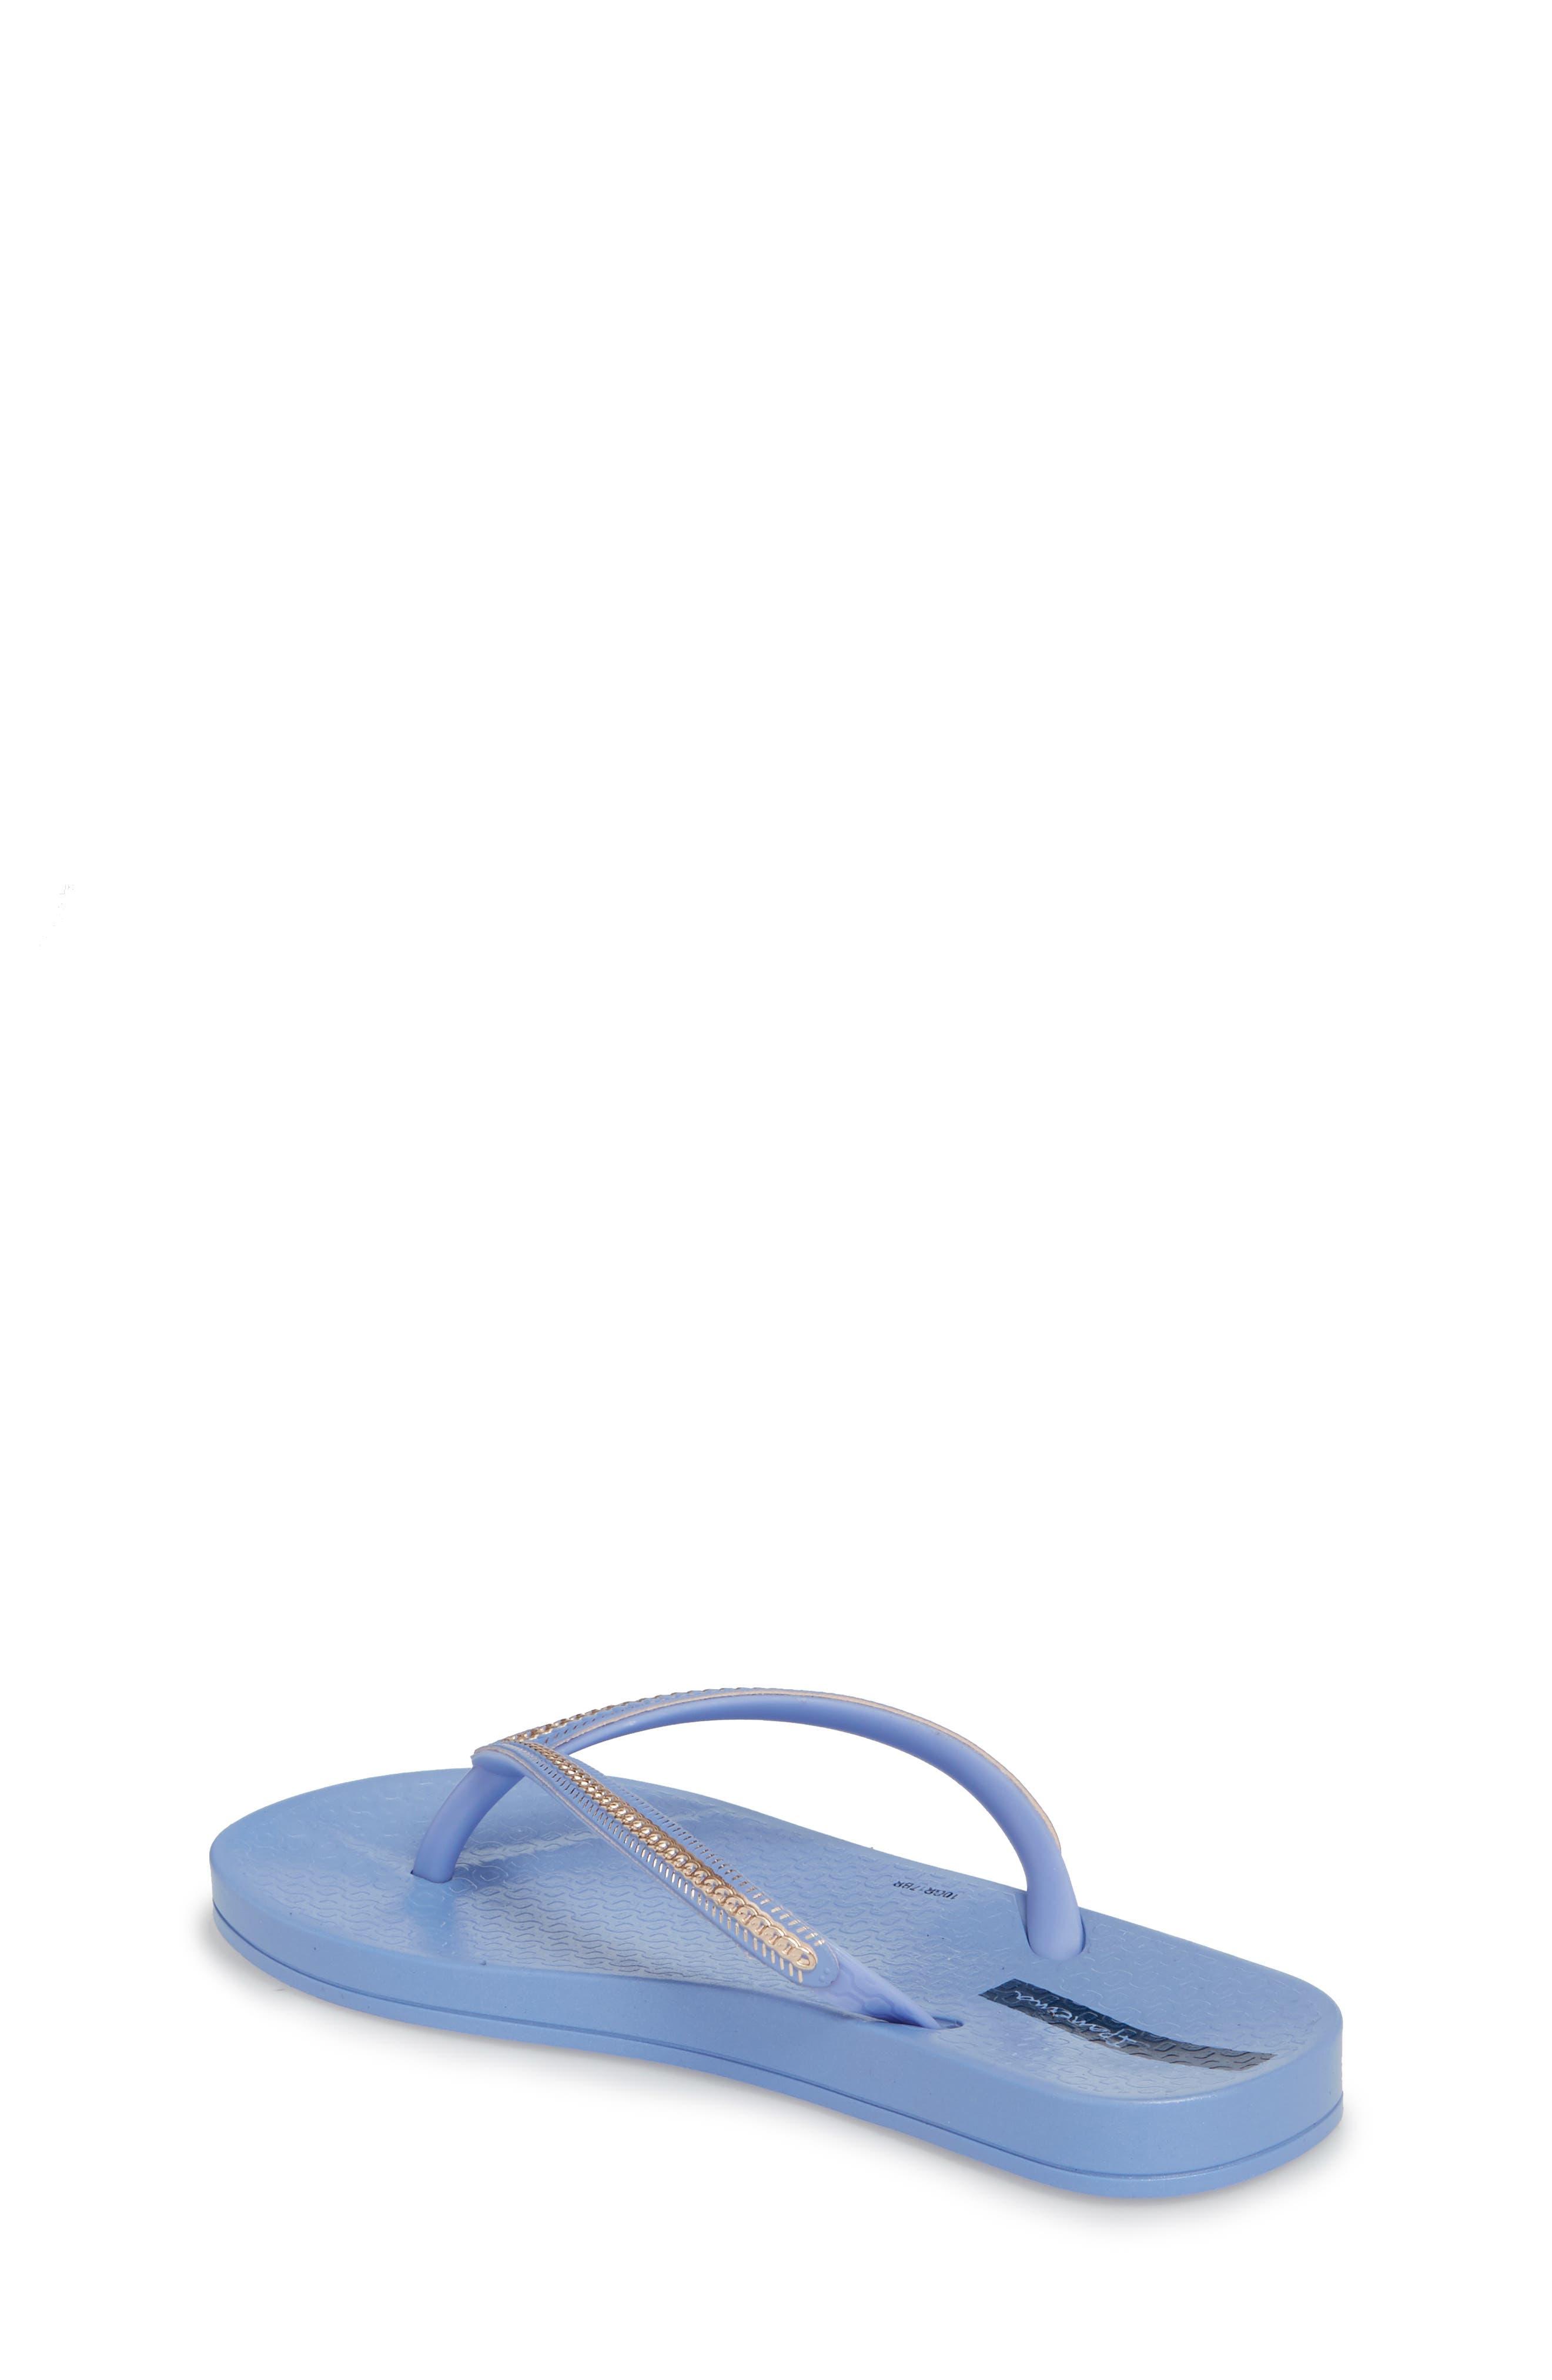 Ana Metallic Flip Flop,                             Alternate thumbnail 2, color,                             Blue/ Rose